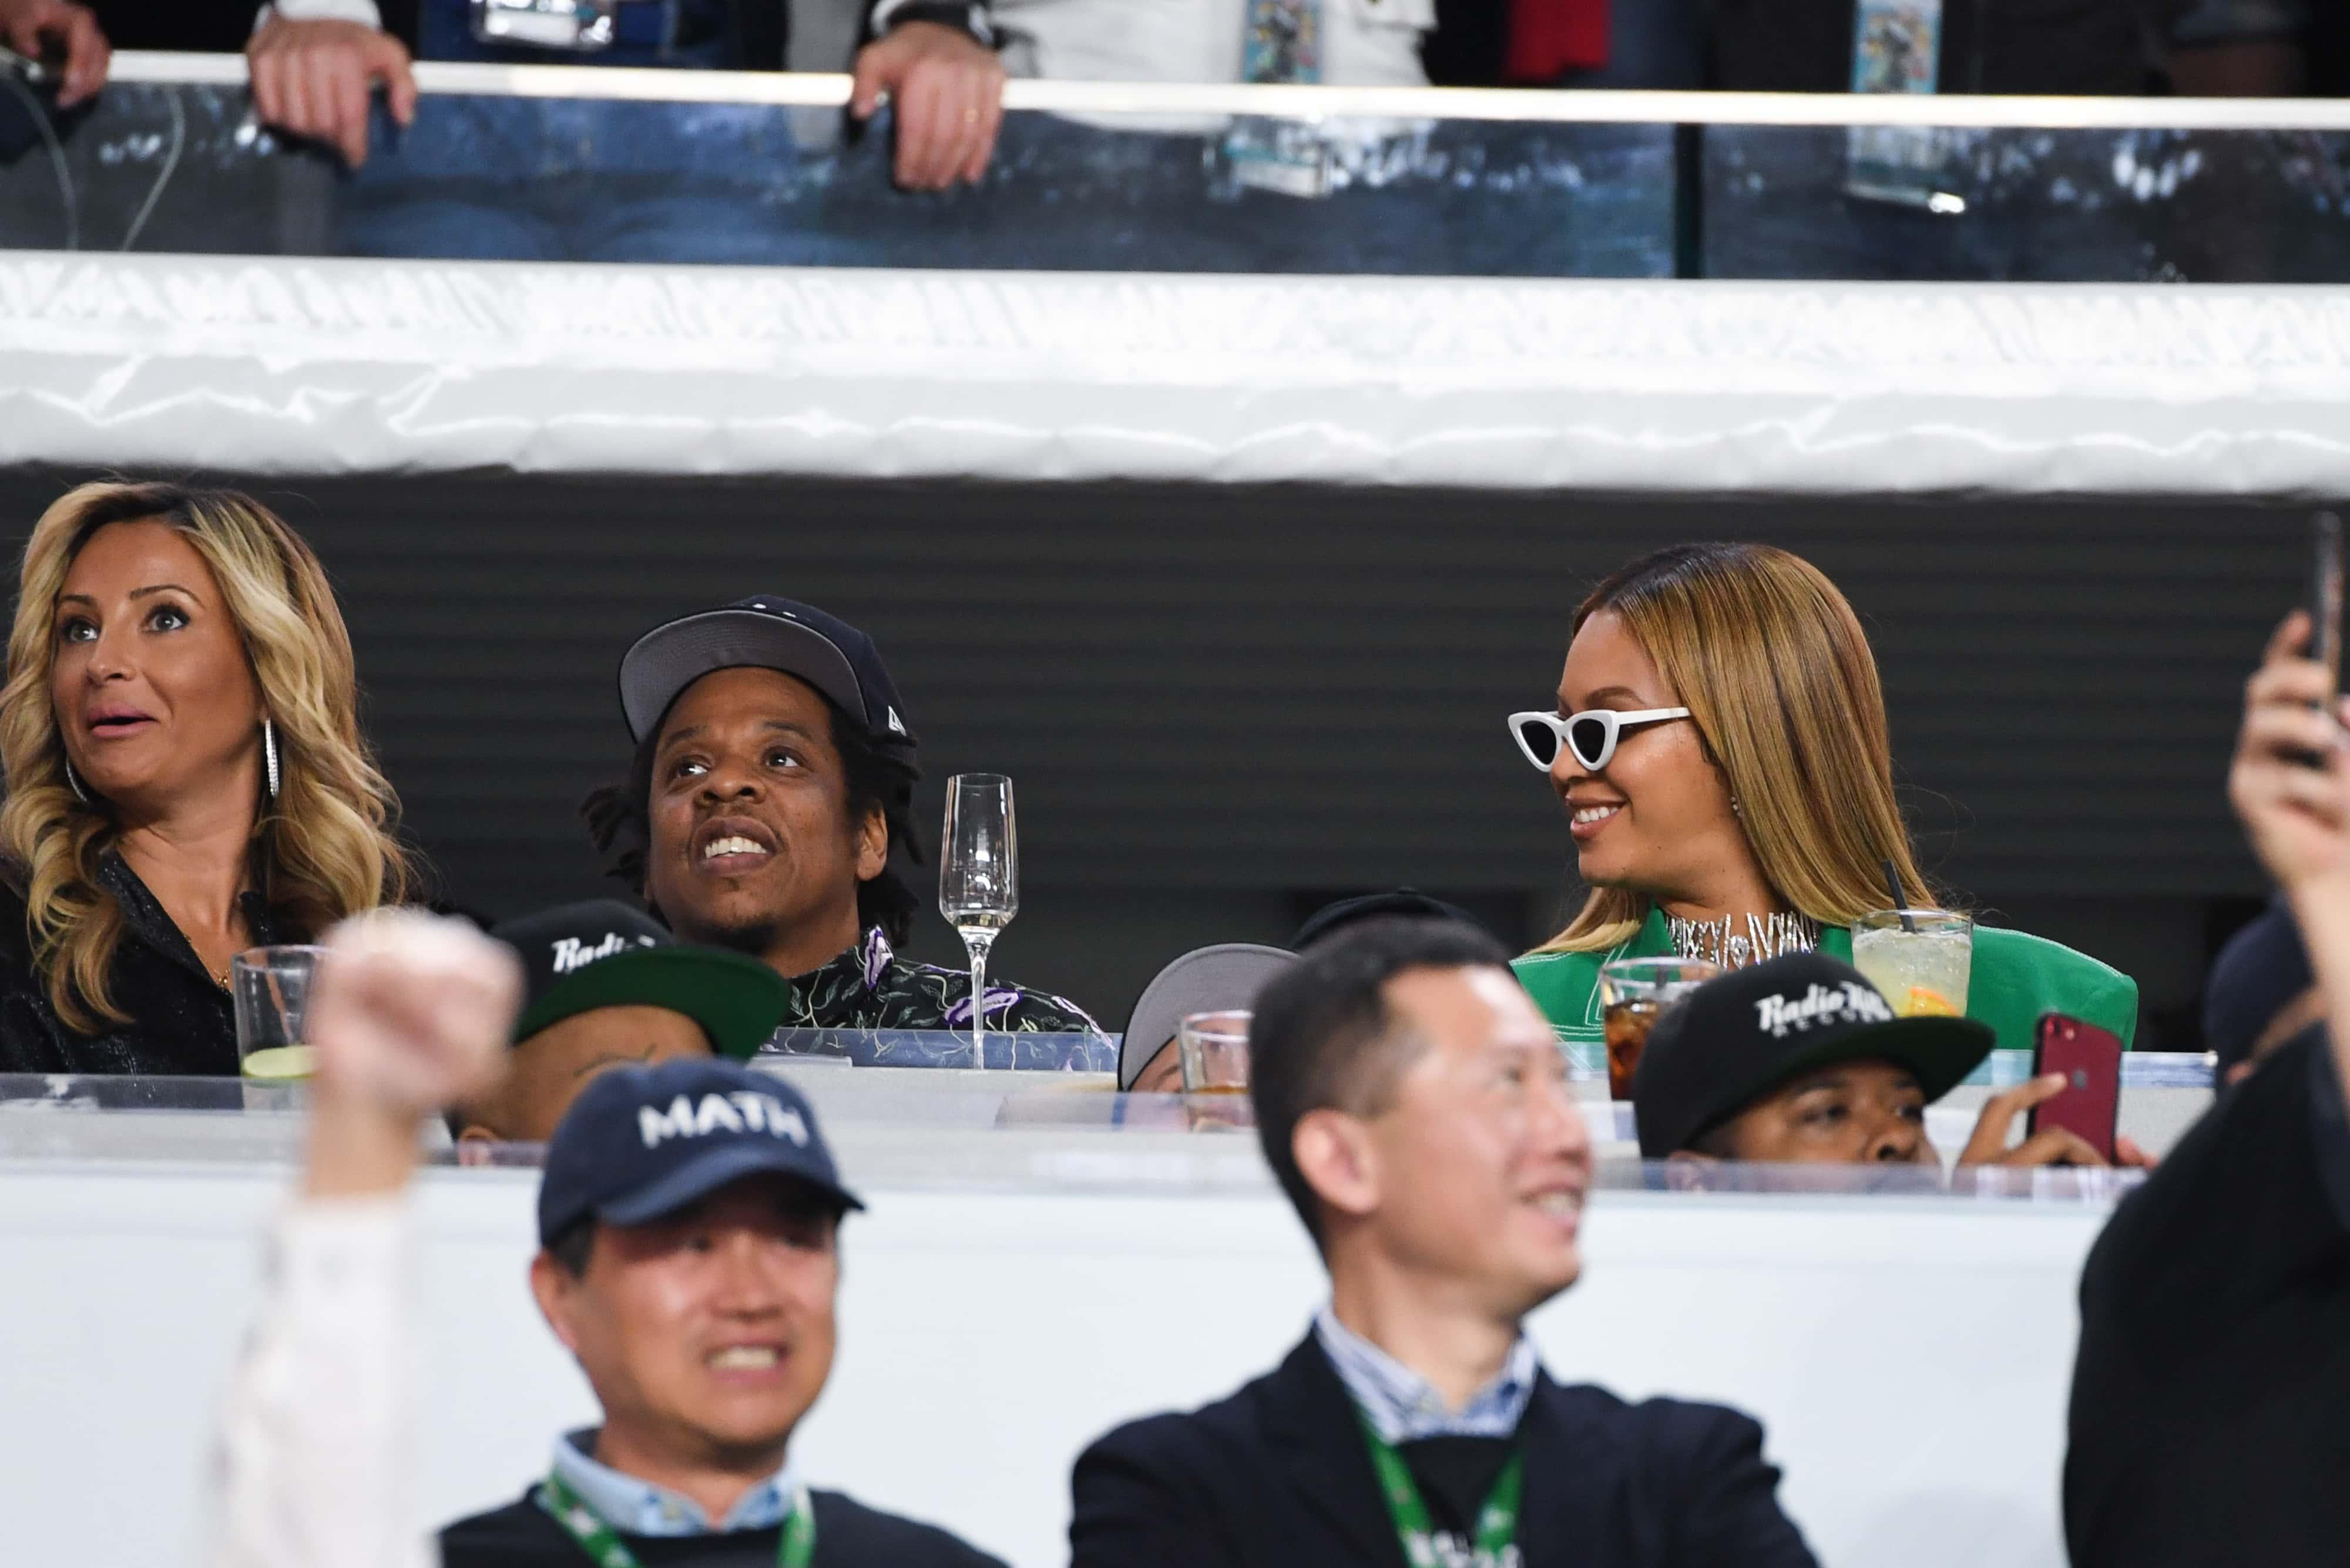 Beyoncé και Jay-Z παρέμειναν καθιστοί κατά τη διάρκεια του εθνικού ύμνου